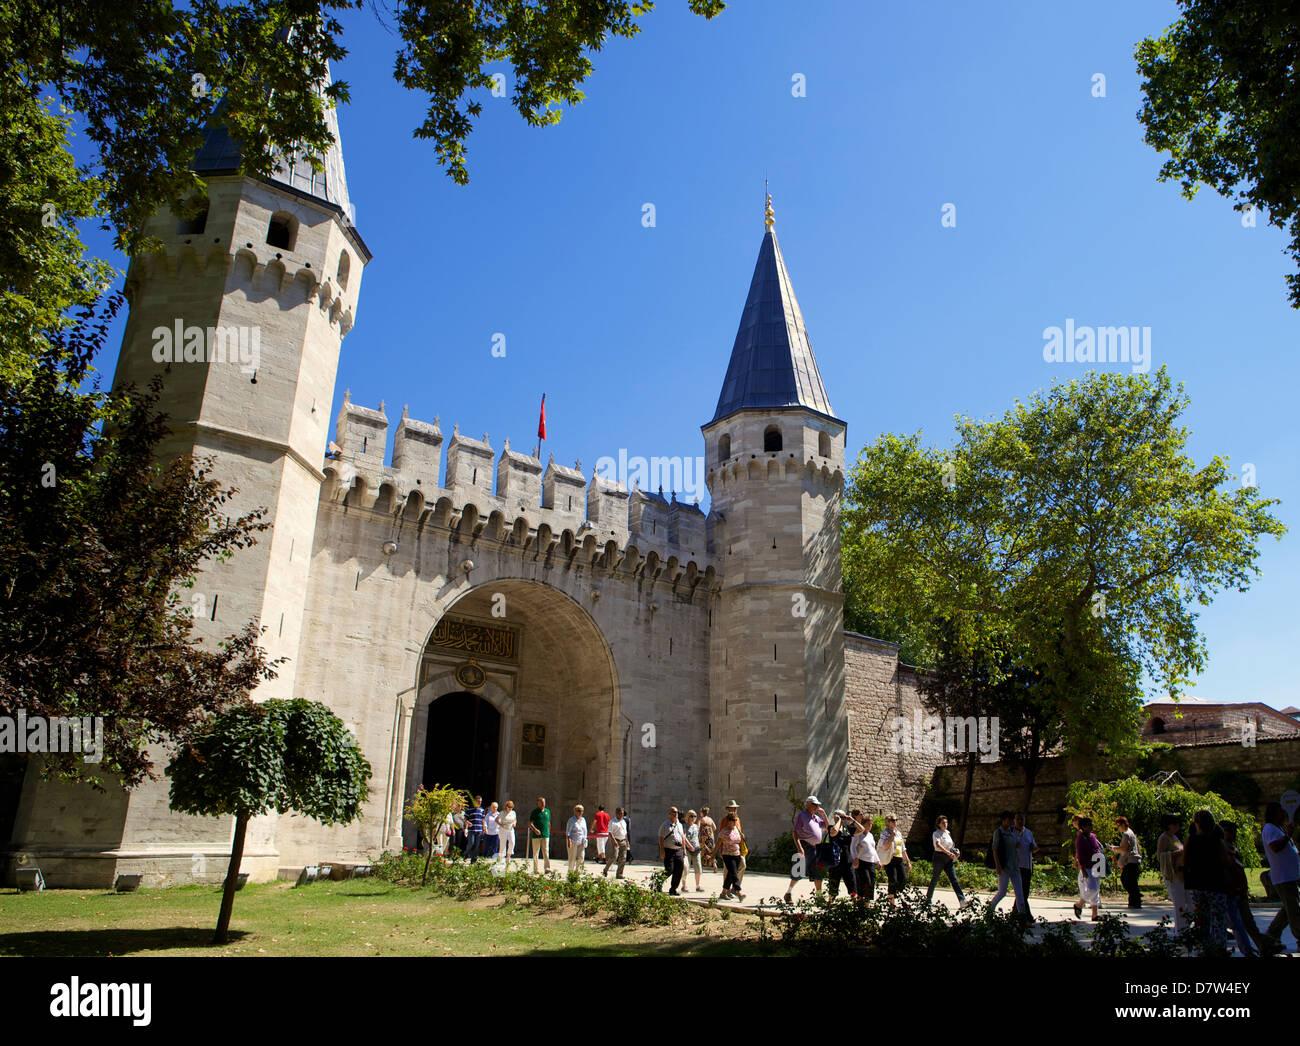 Der Eingang Sultane Topkapi Palast, Istanbul, Türkei Stockbild